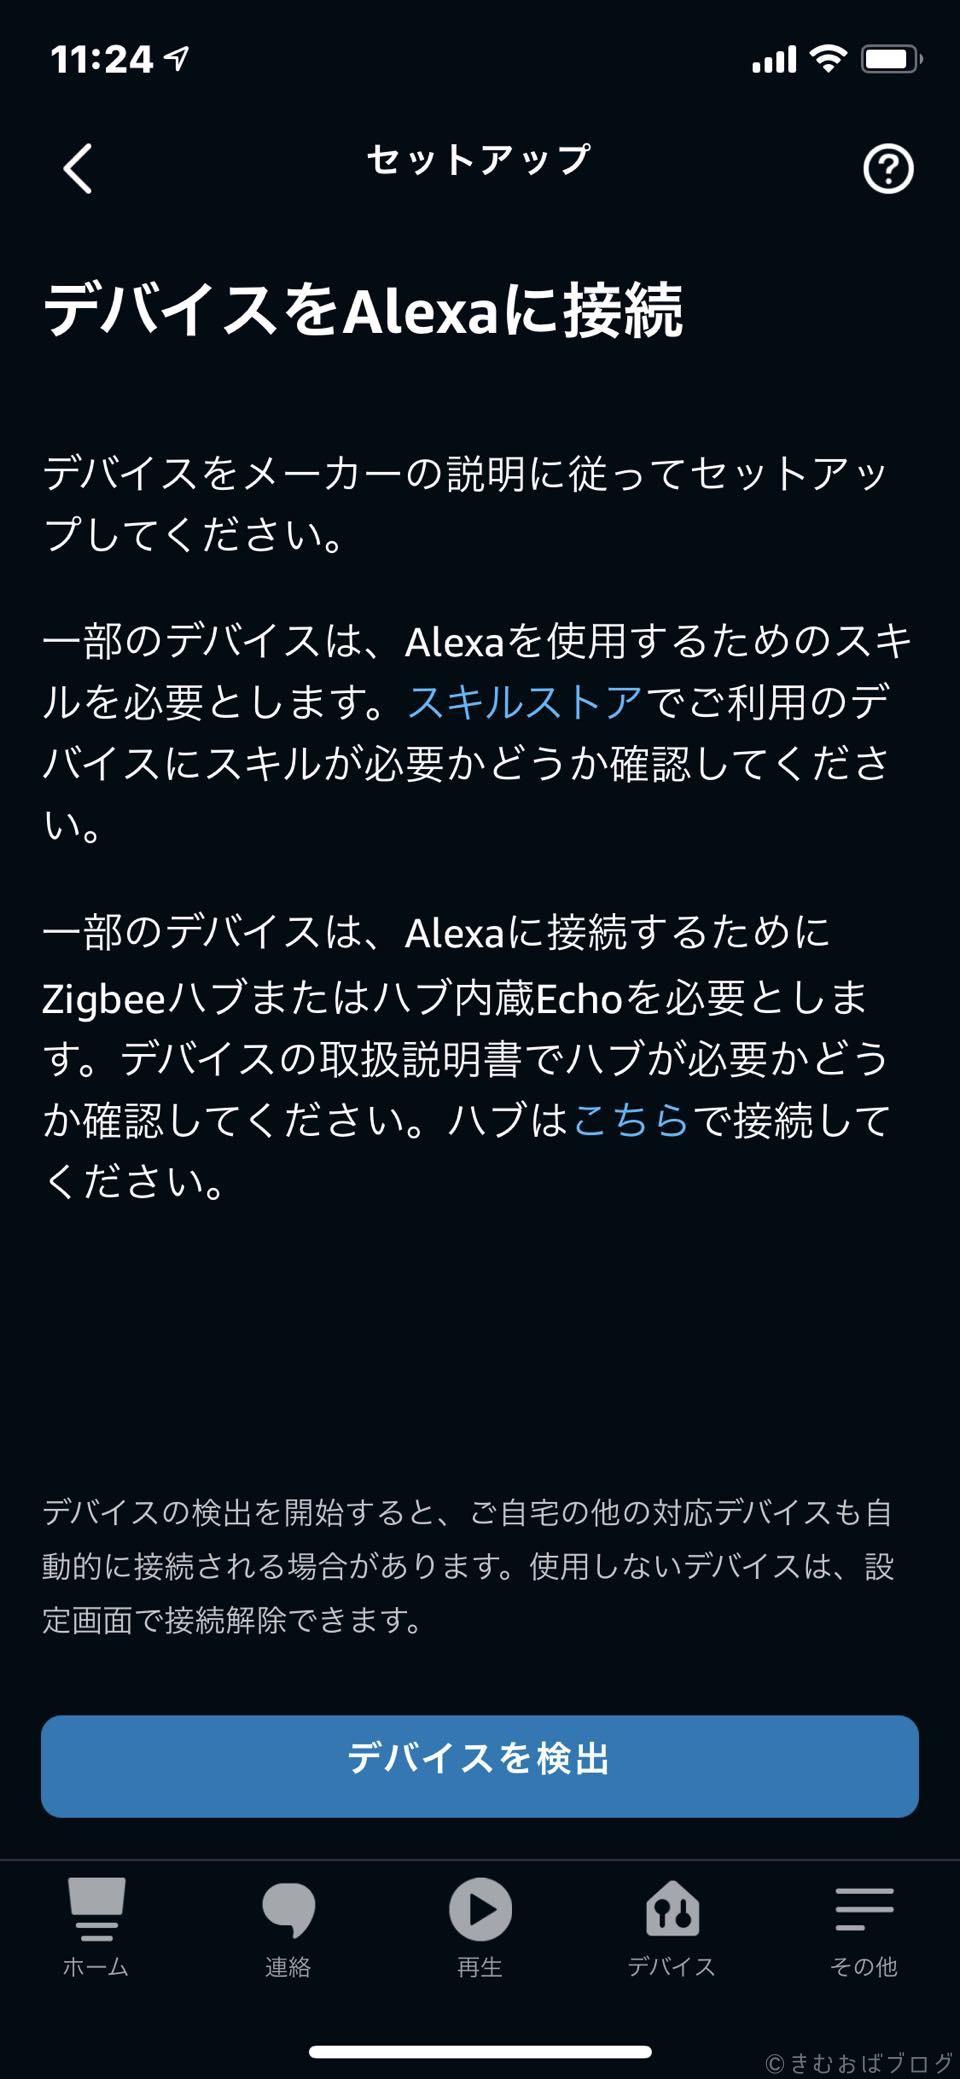 alexaアプリ 新しいデバイスの検出